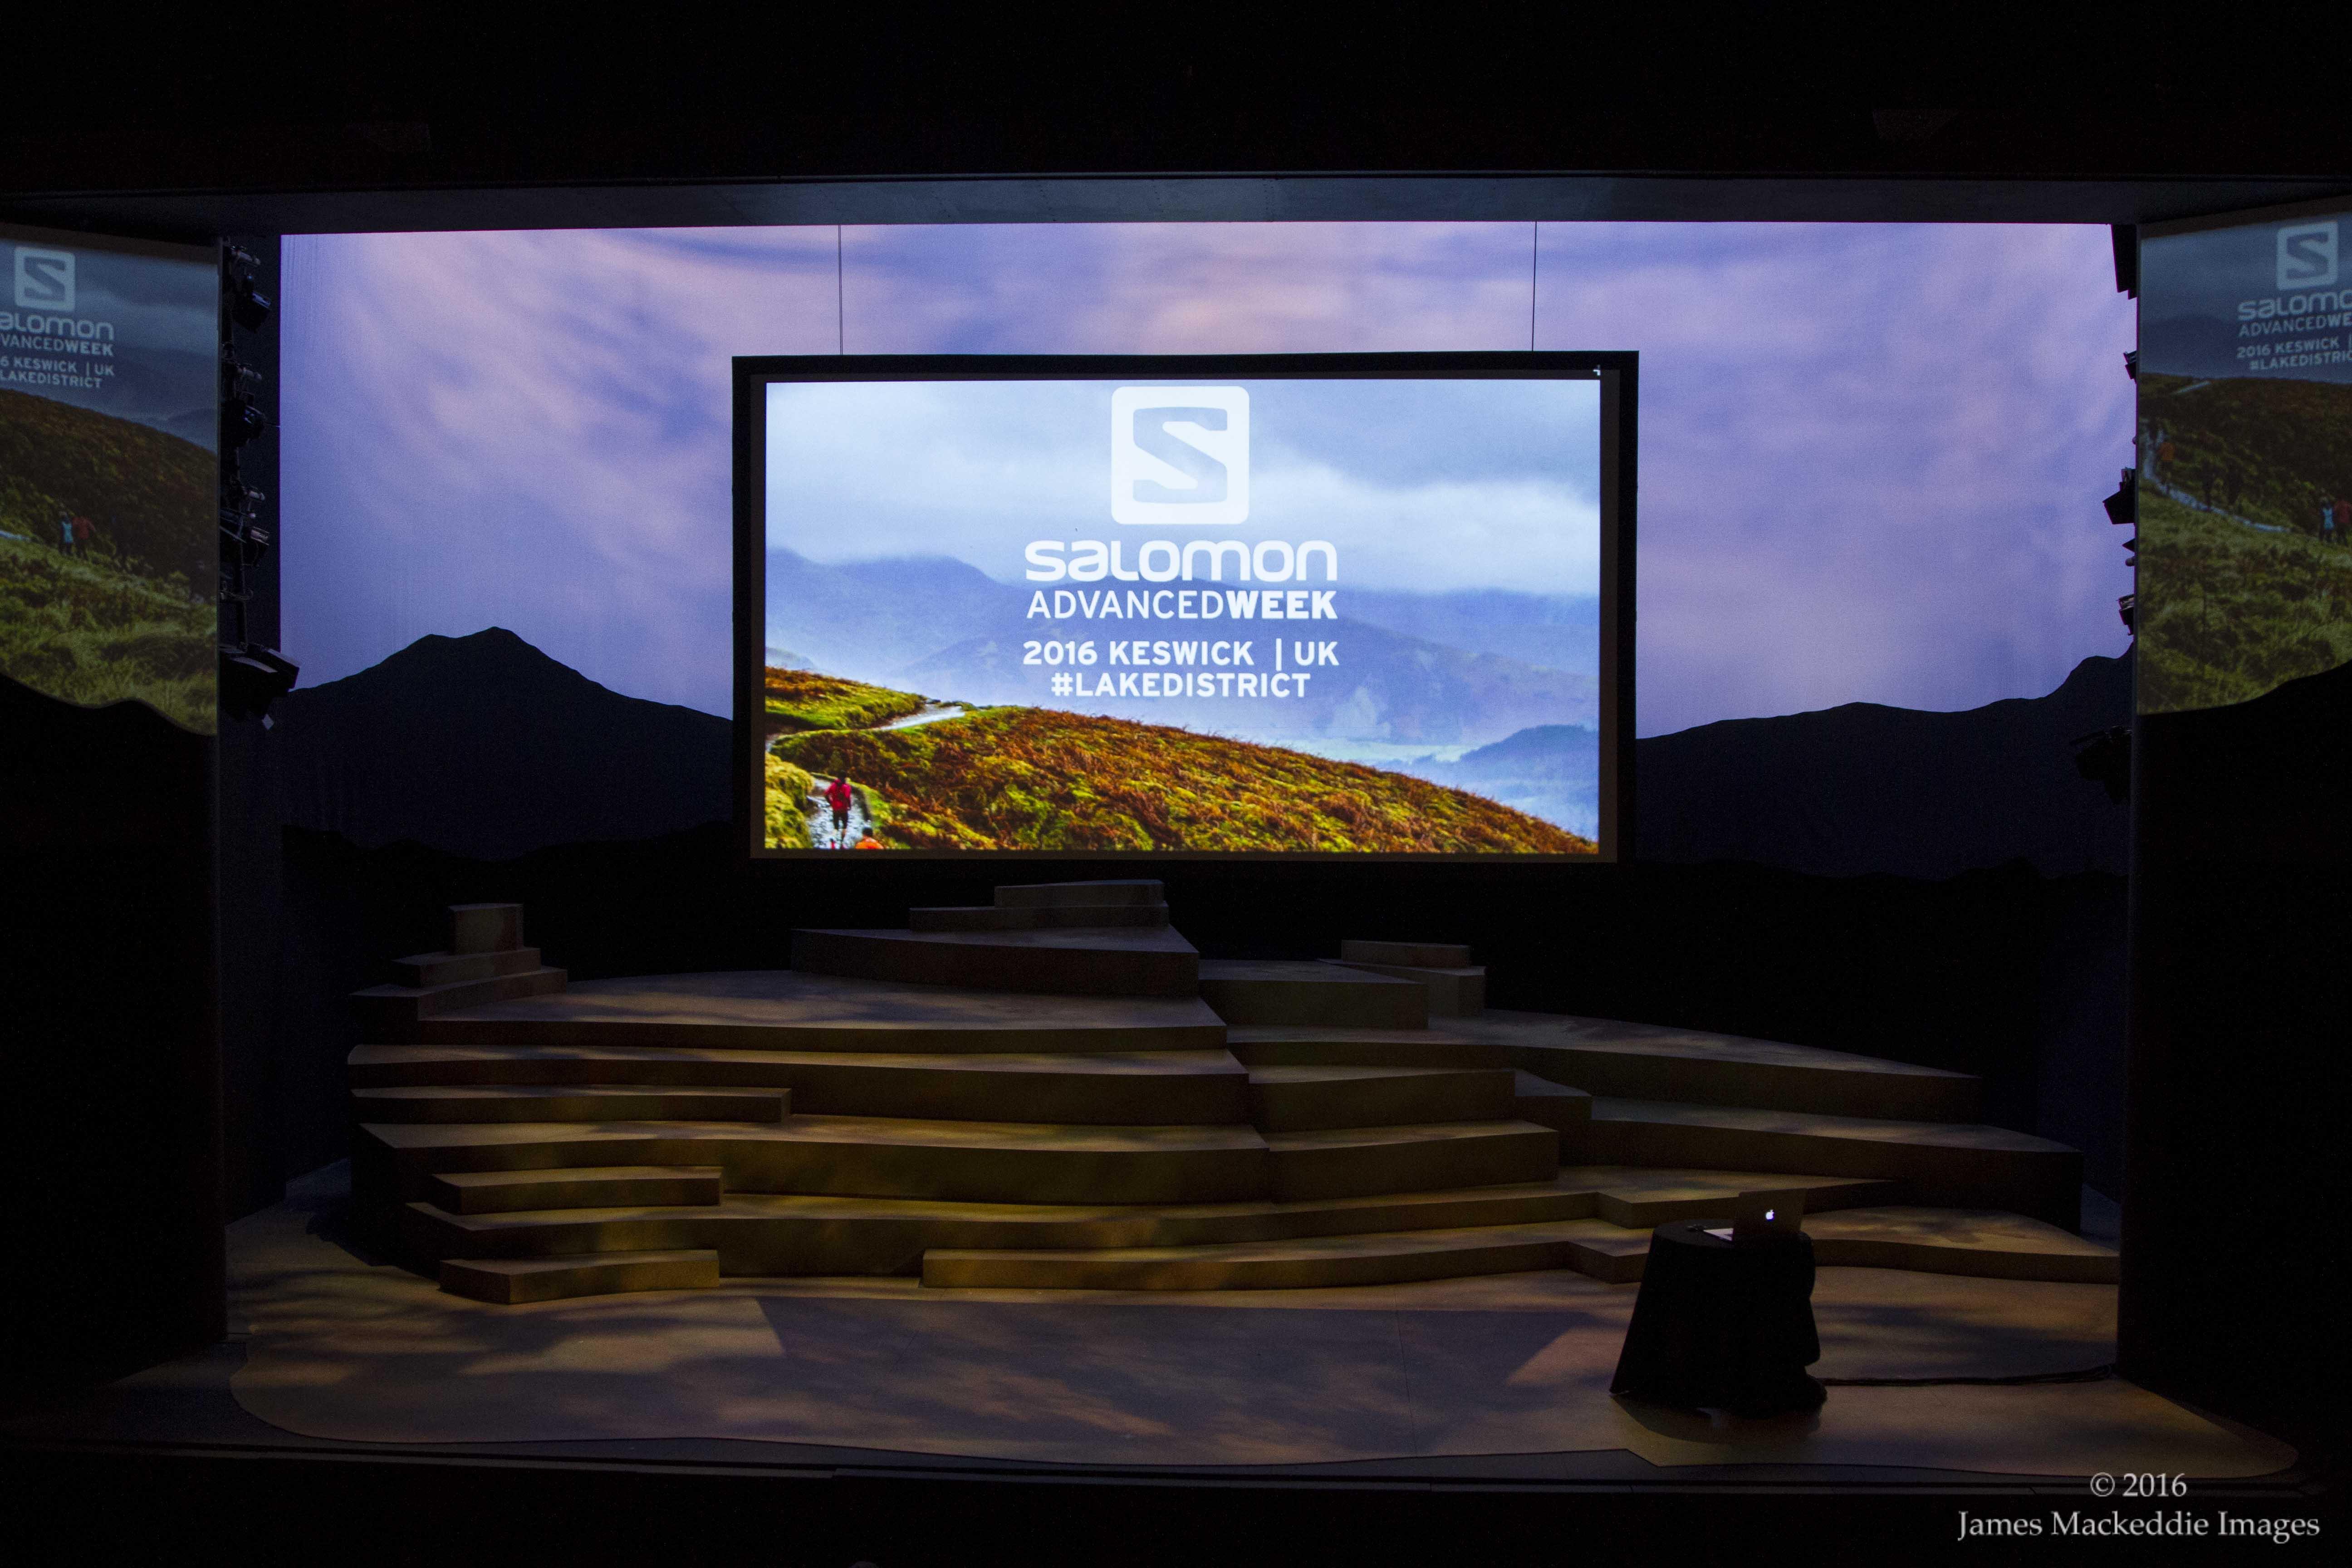 Salomon Advanced Week theatre empty